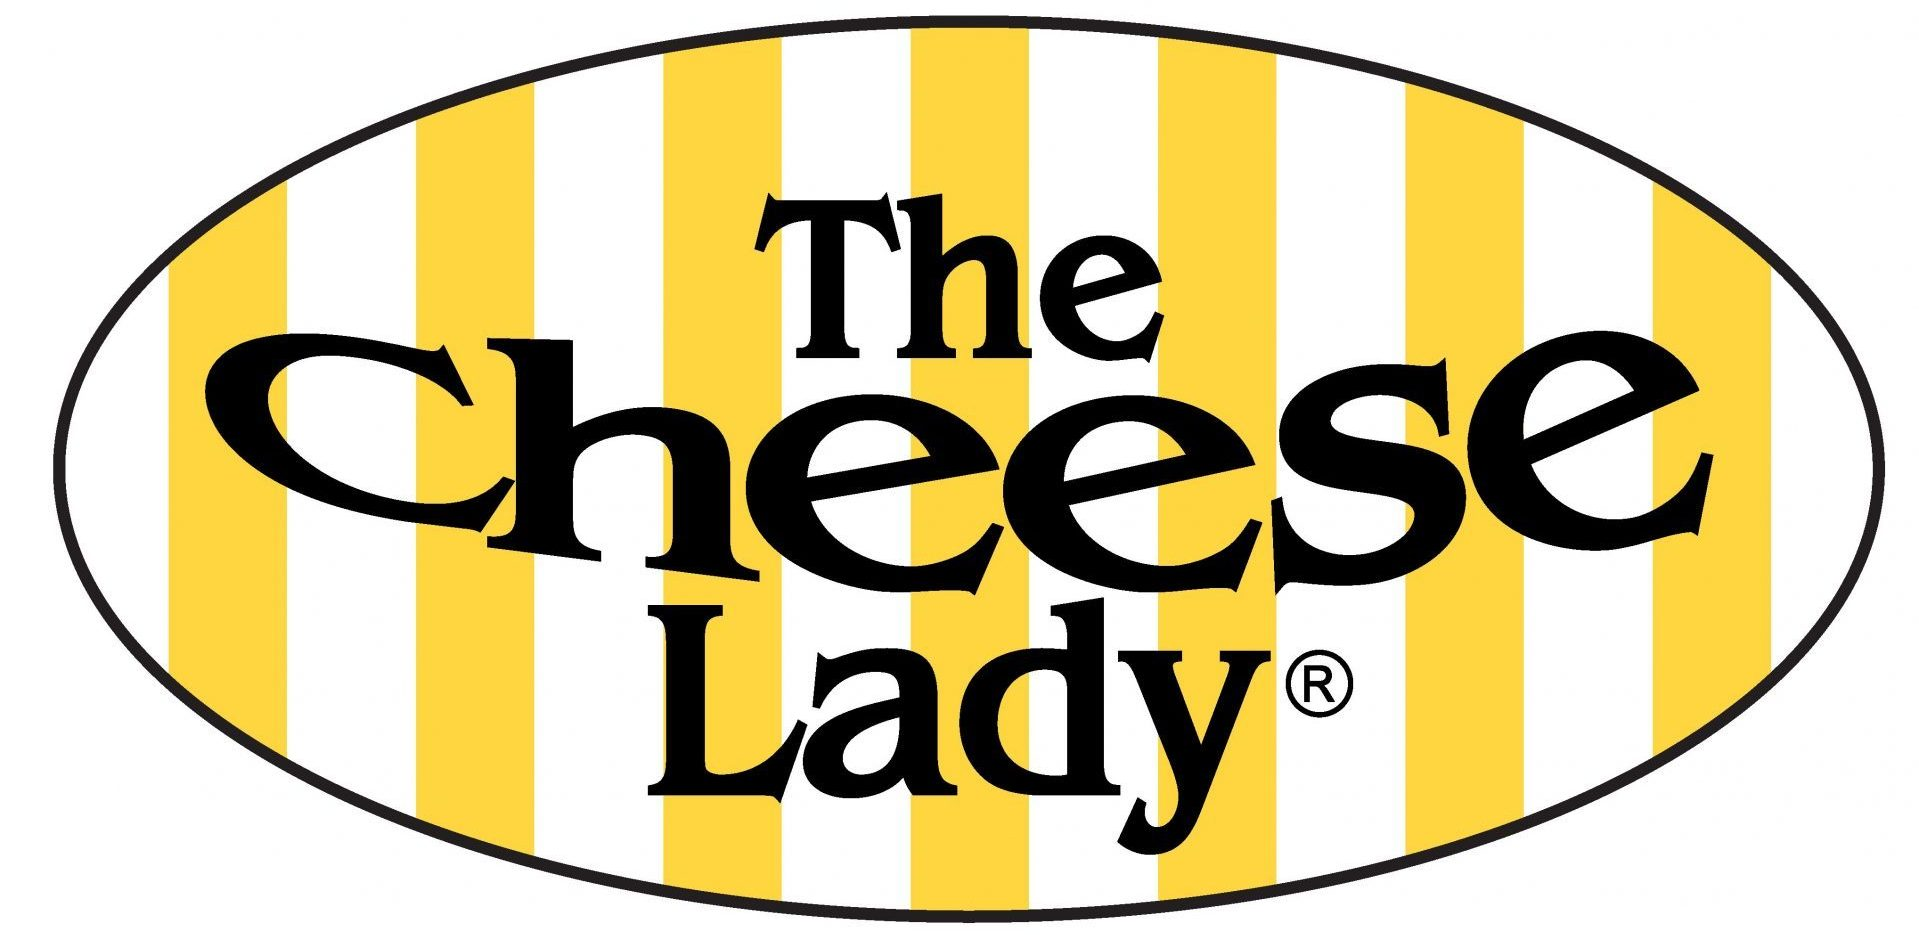 Cheese-Lady-Logo-Official730-e1541461116819.jpg